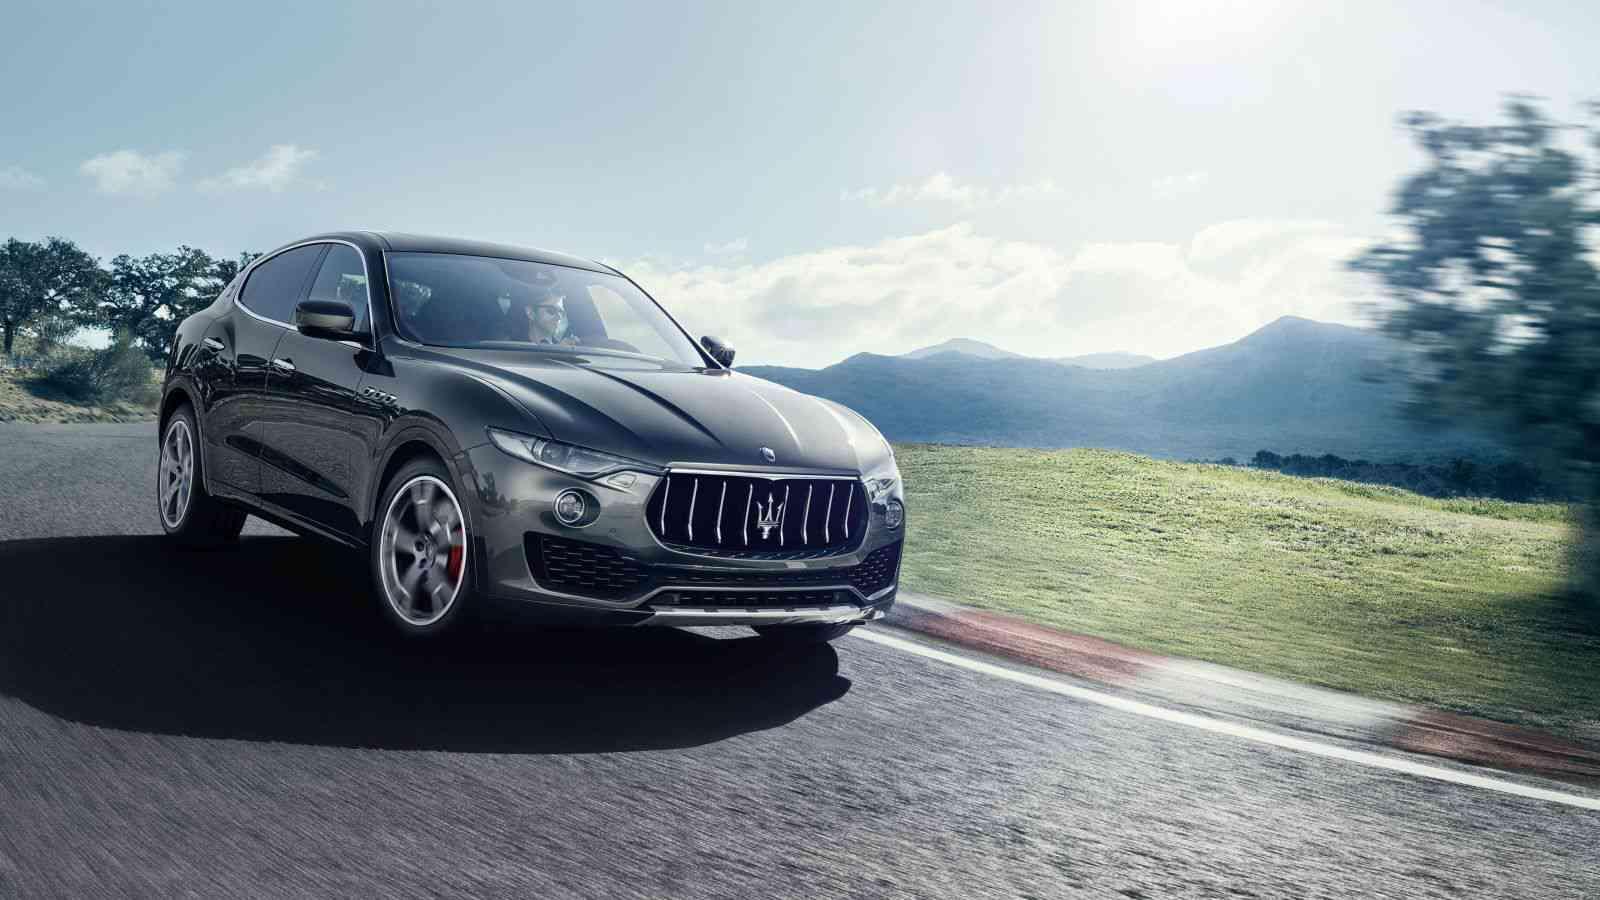 https://www.rideinindia.com/wp-content/uploads/2017/07/Maserati-Levante-5.jpg